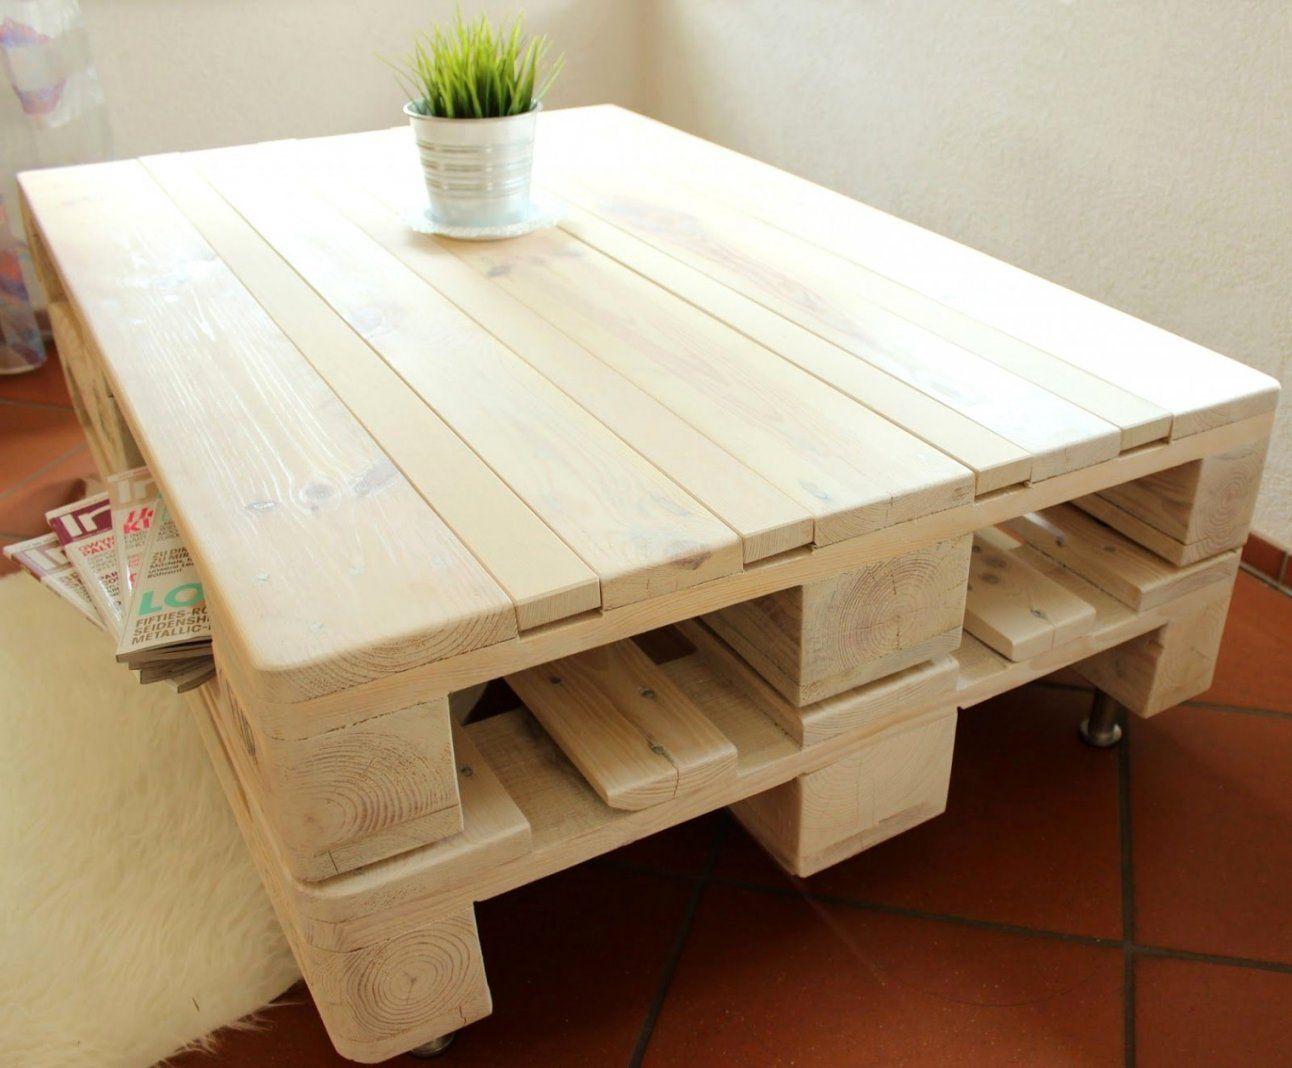 Couchtisch Palette Diy The Best 20 Diy Pallet Coffee Table